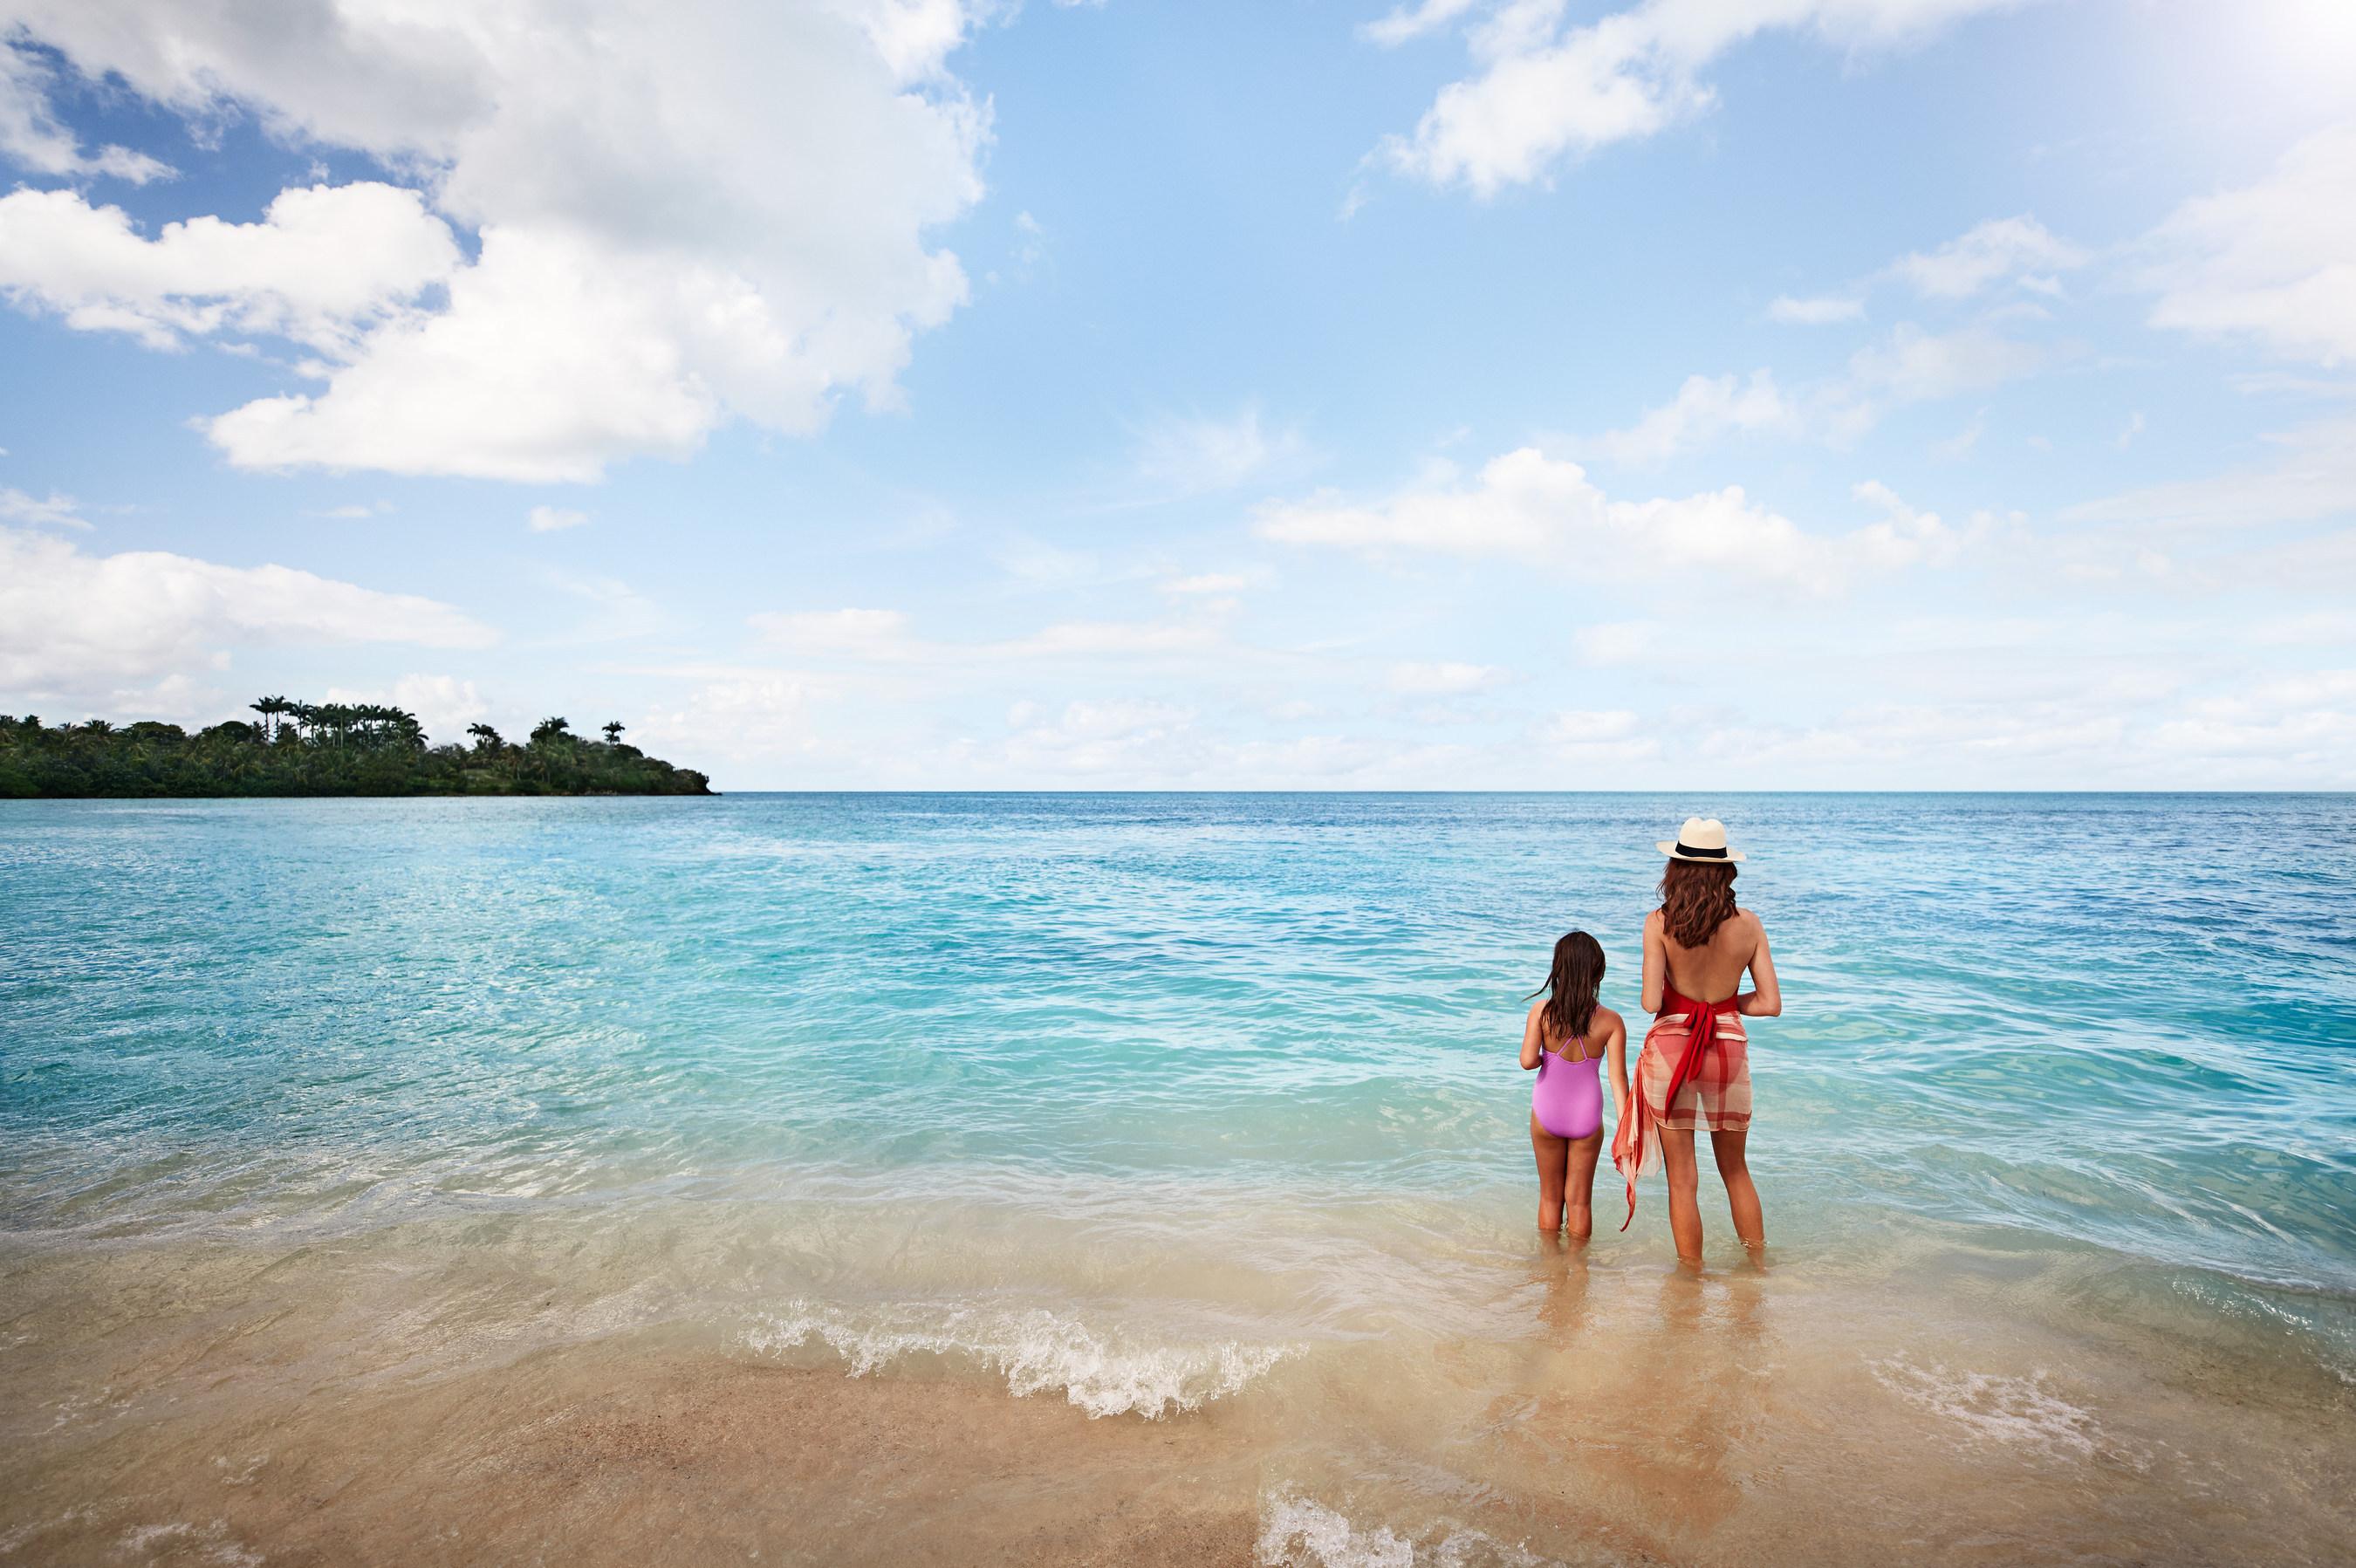 Well Kept Secret Take A Cruise To Enjoy Worlds Best Beaches